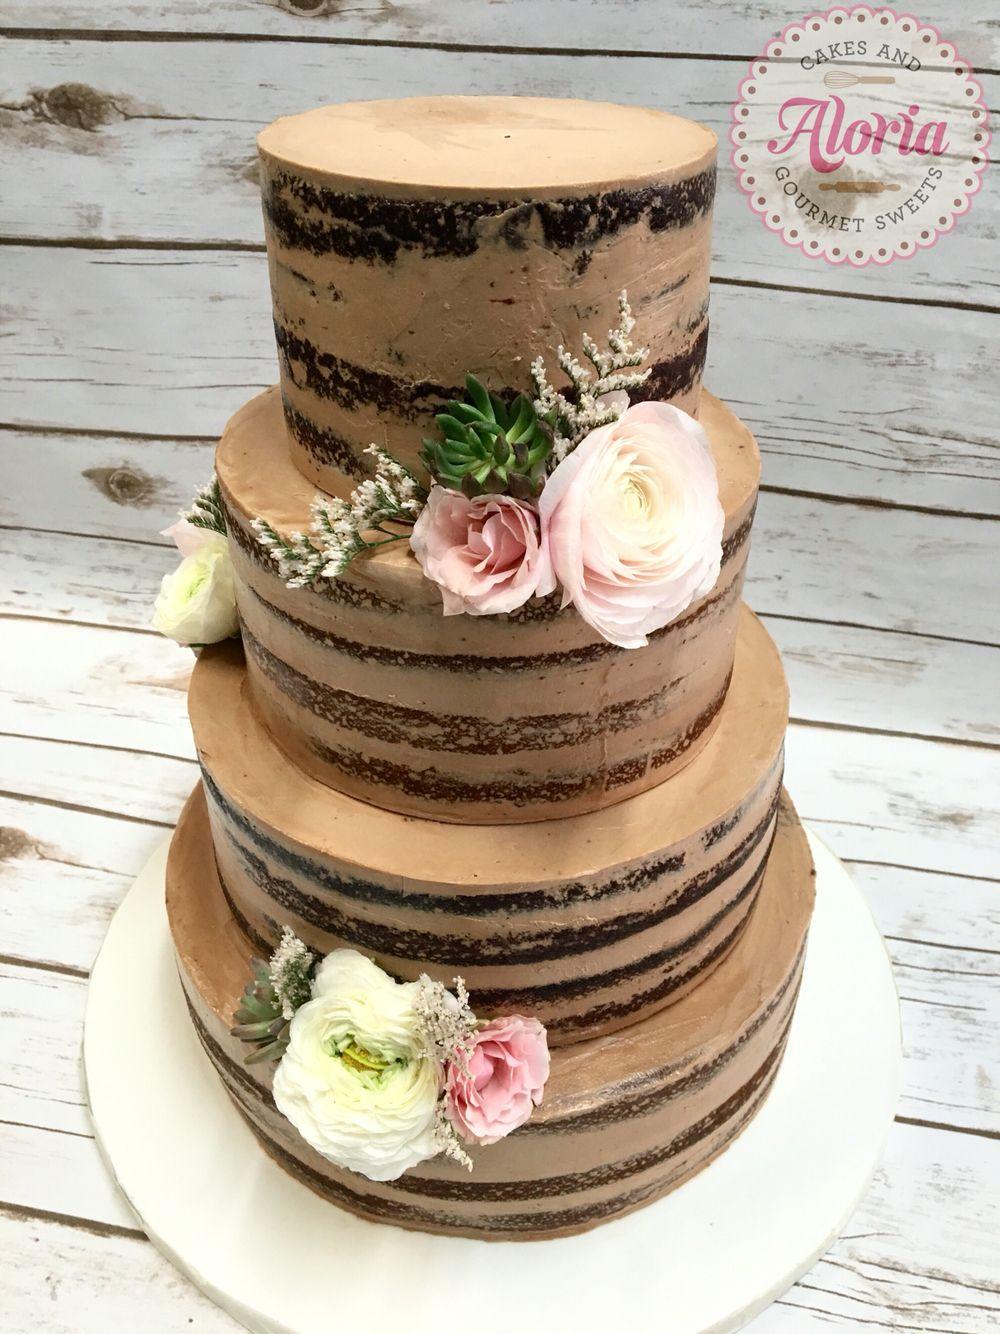 Wedding Cake With Fresh Flowers Alternating Chocolate And Vanilla Cakes Nutella Swiss Meringue Ercream